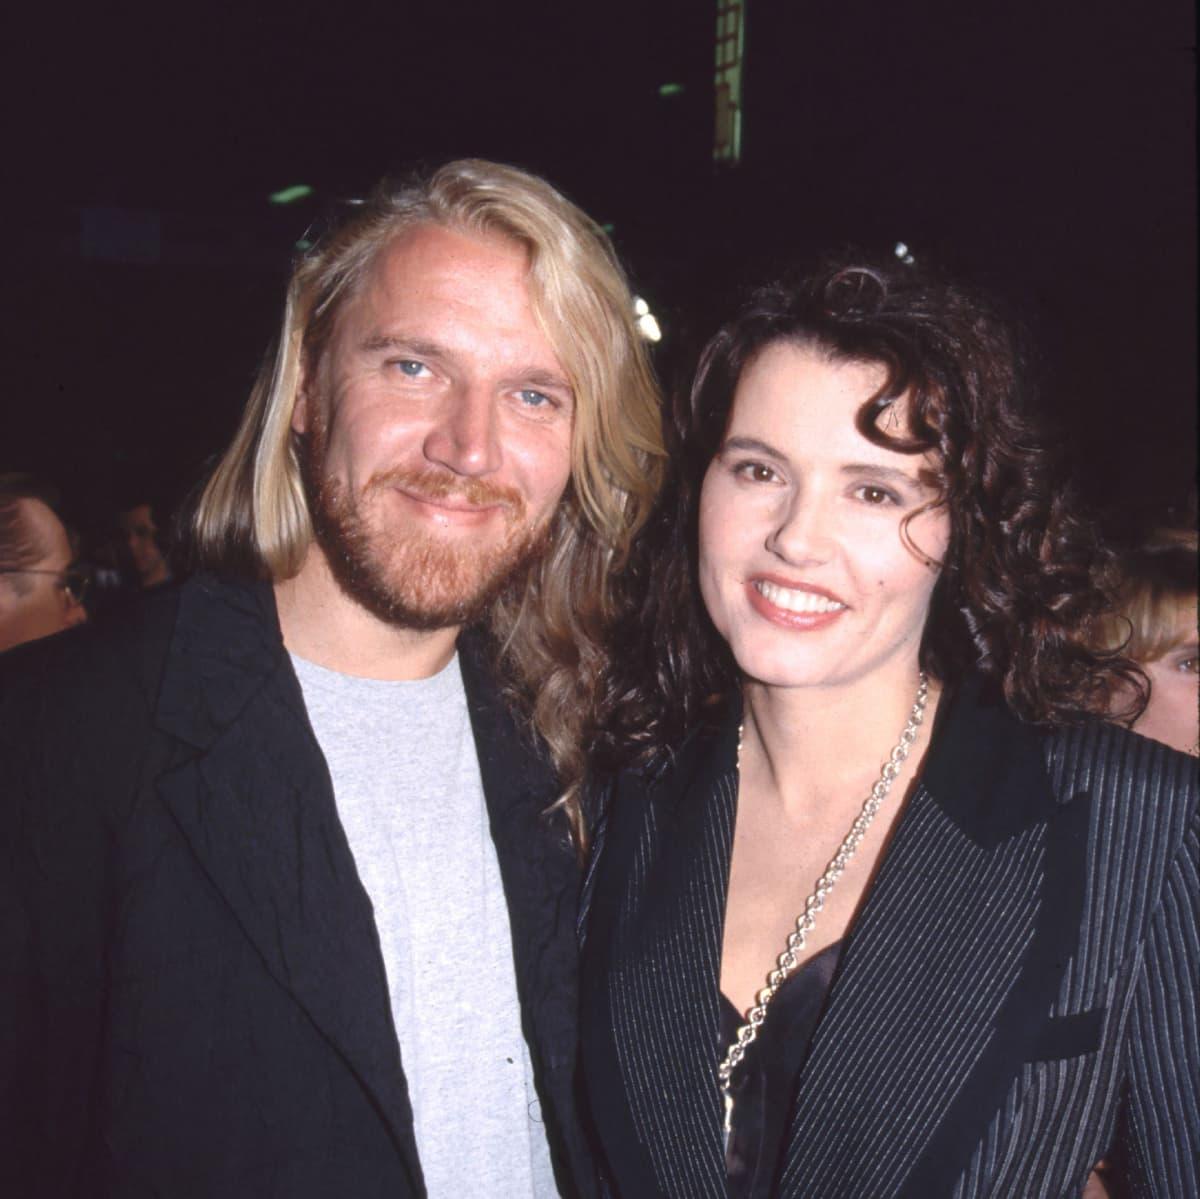 Renny Harlin ja Geena Davis kuvattuna vuonna 1995.